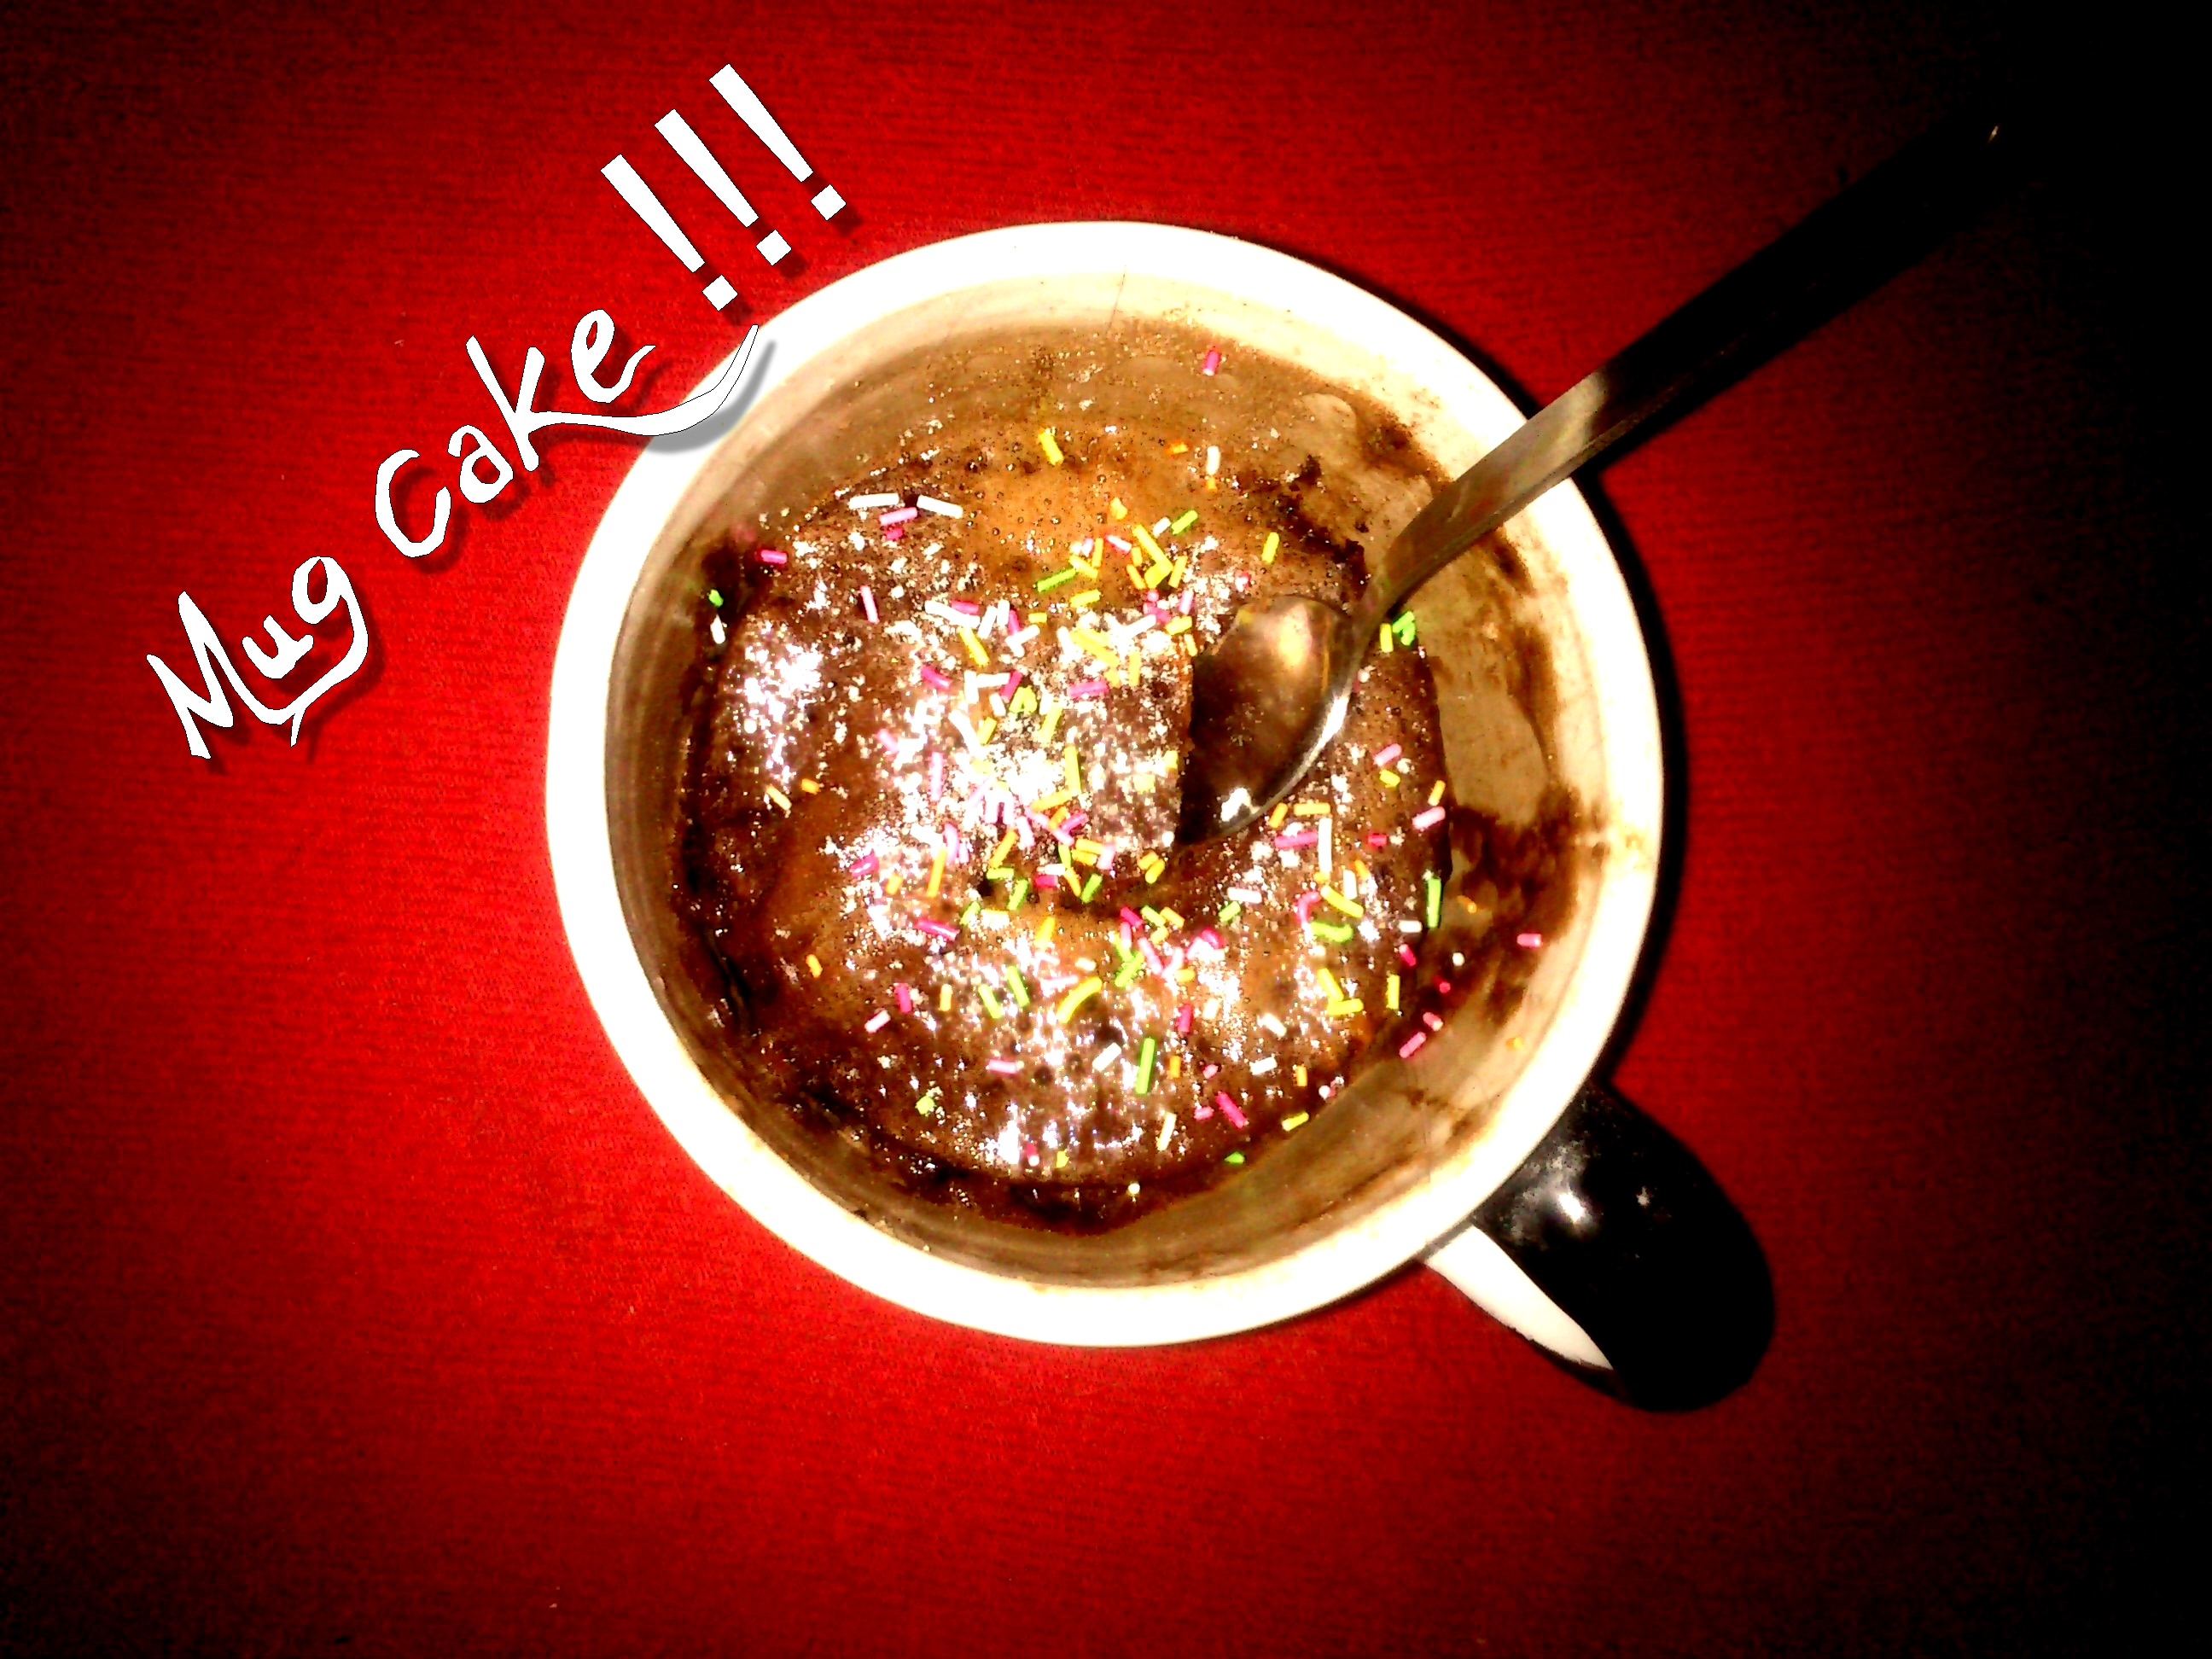 Mug cake (baked in microwave)